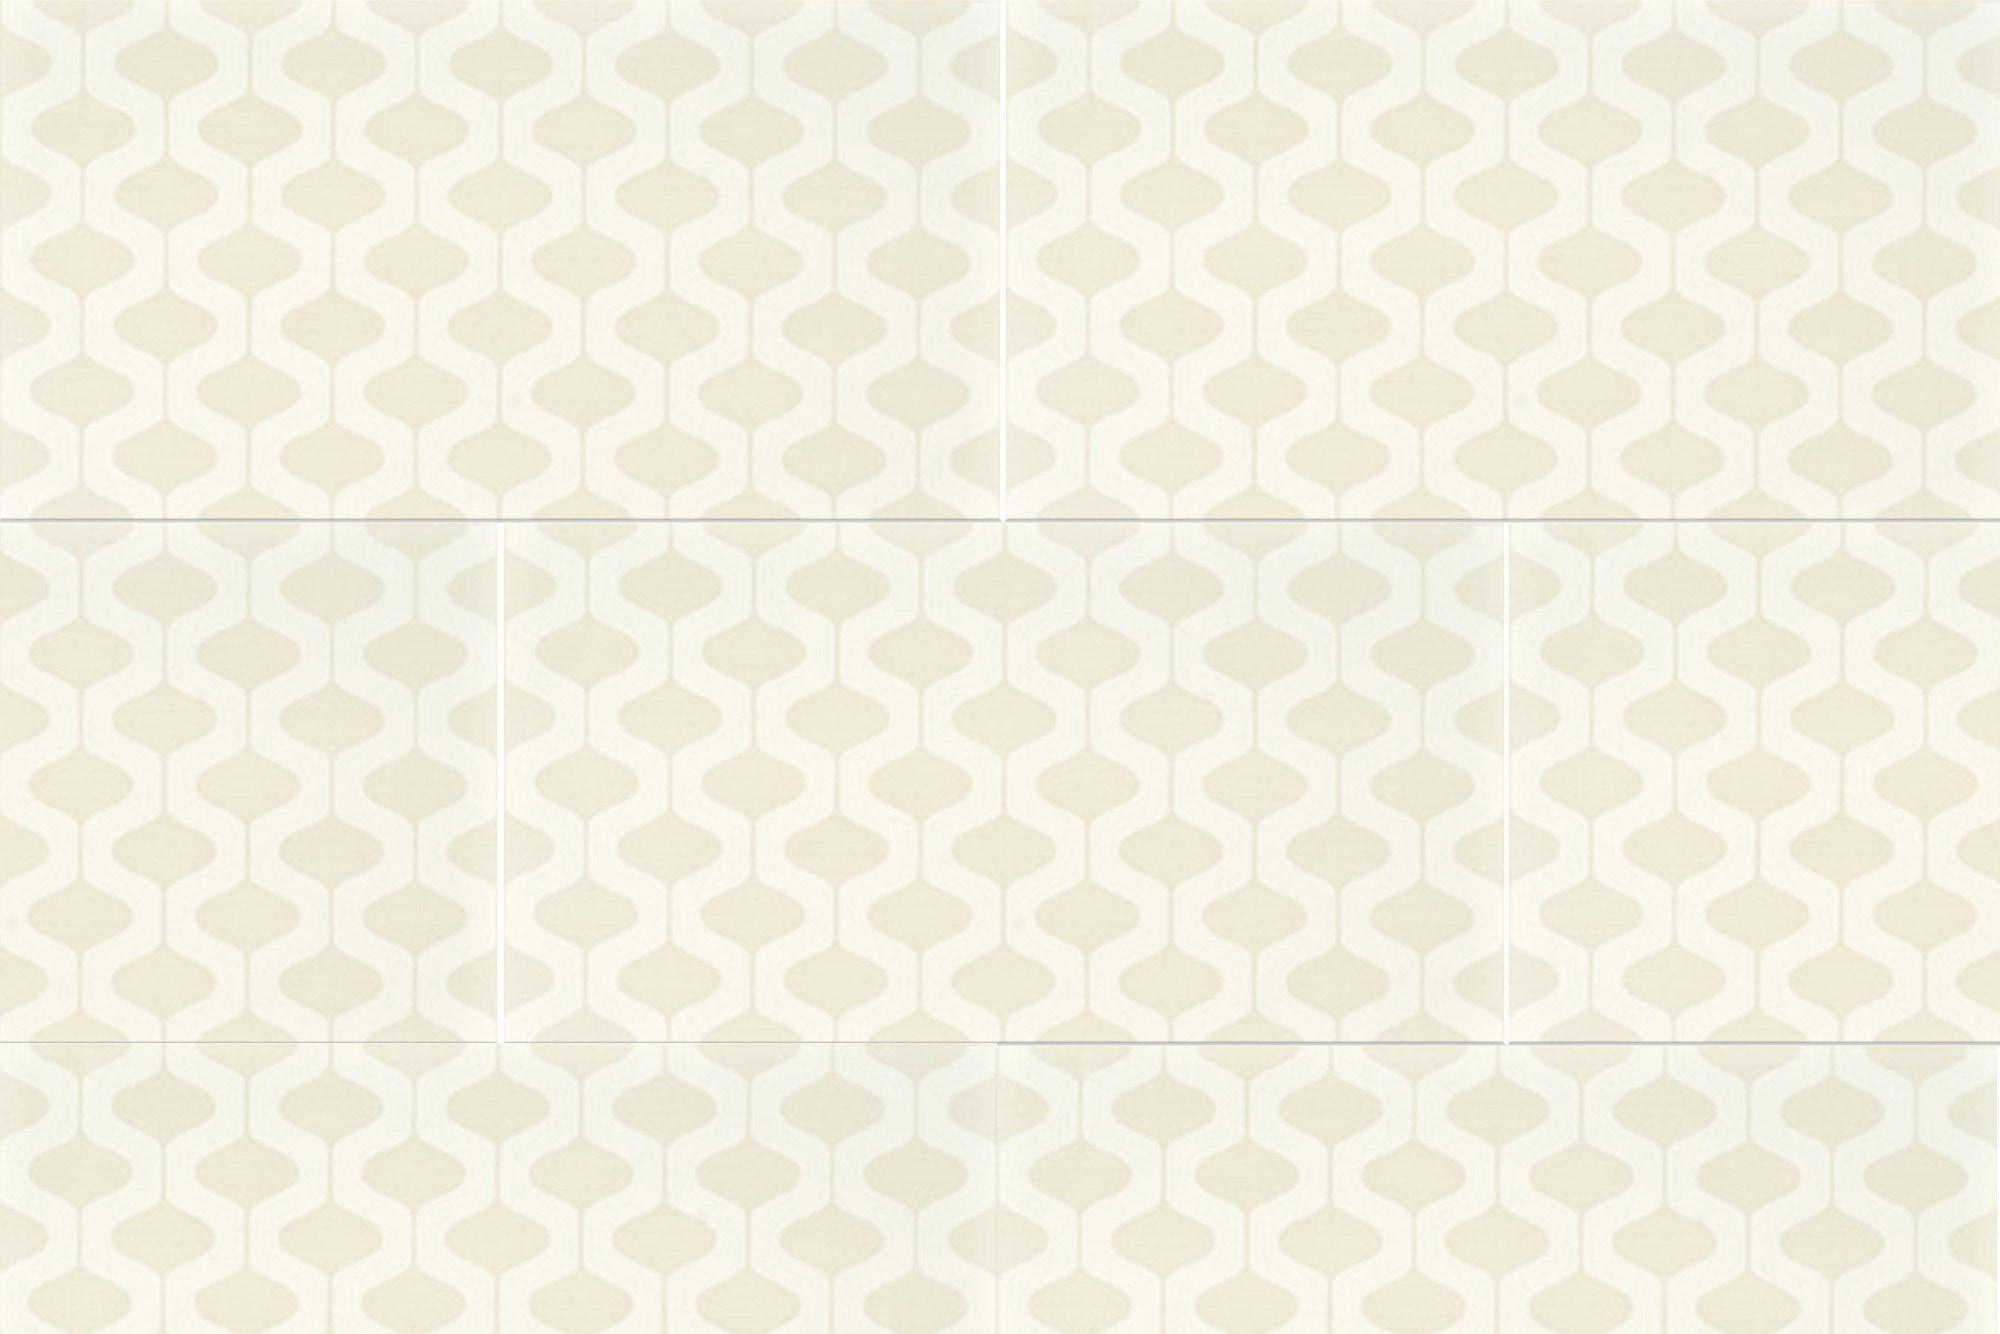 Wall Paper 4-36 Diamond / 12x24 Olympus - Morpheus 0